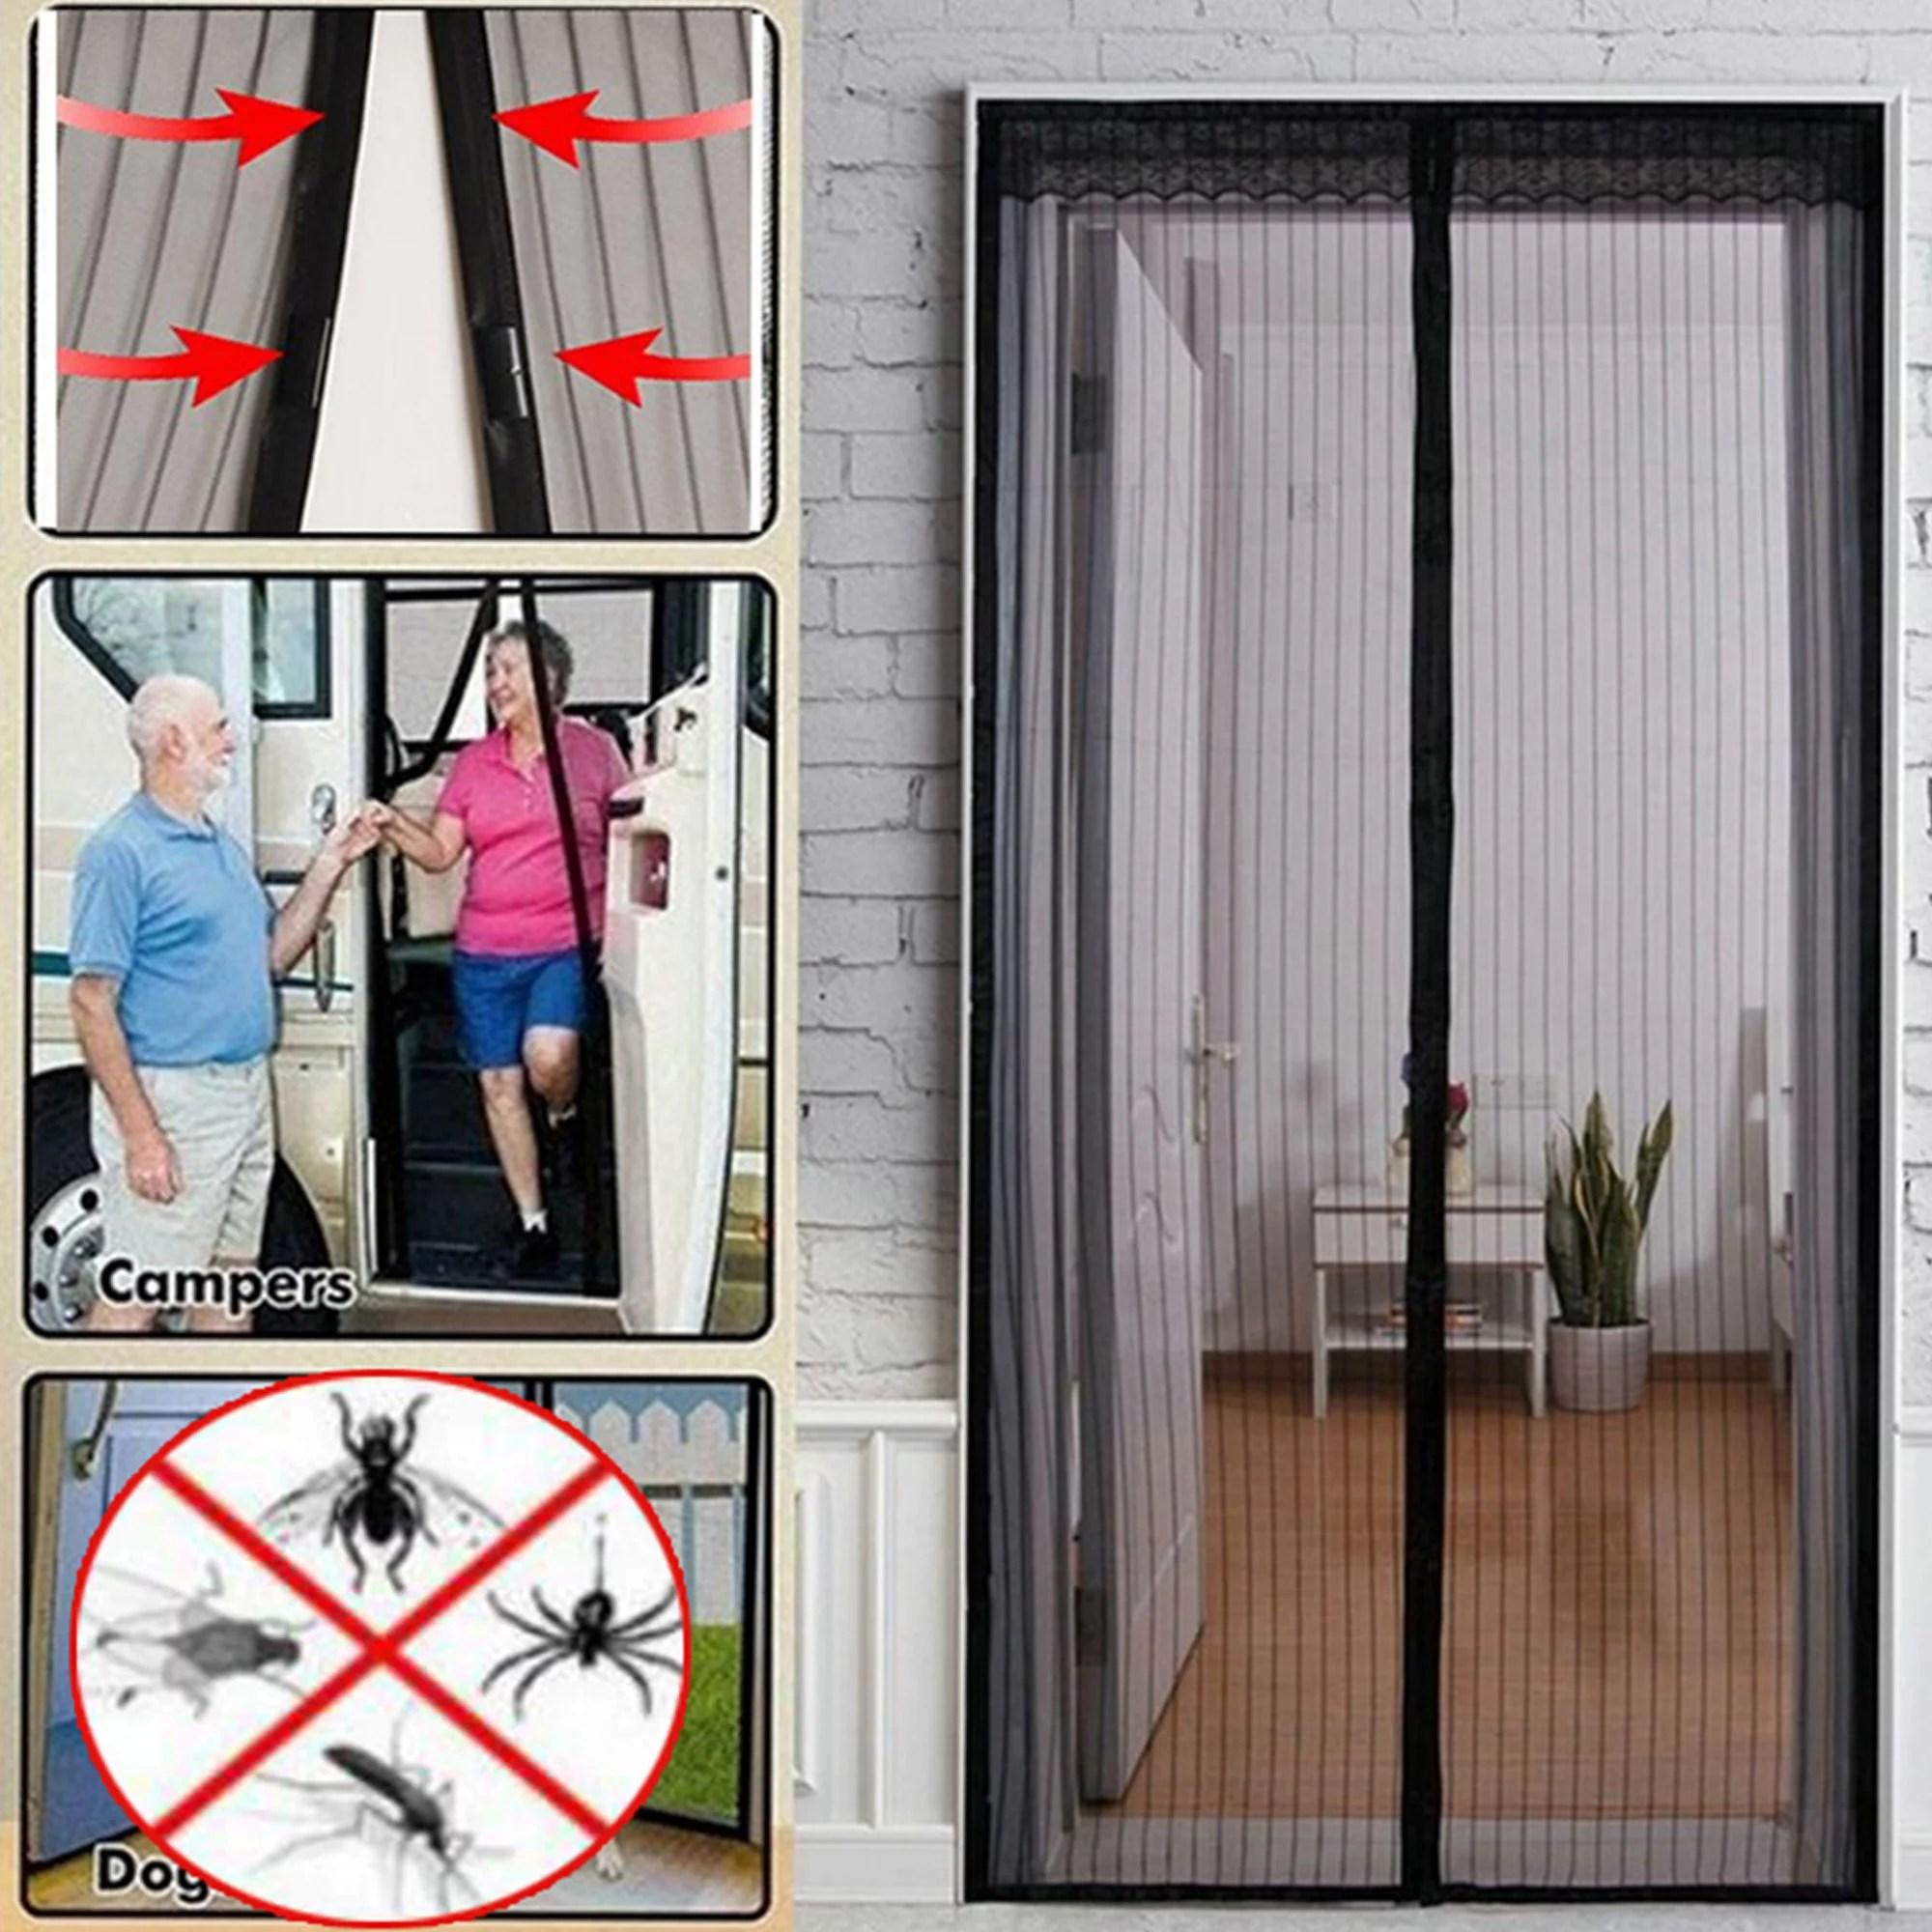 nk home magnetic screen door full frame magnetic door screen with mesh curtain pet friendly door mesh screen with magnet magnetic door screen door